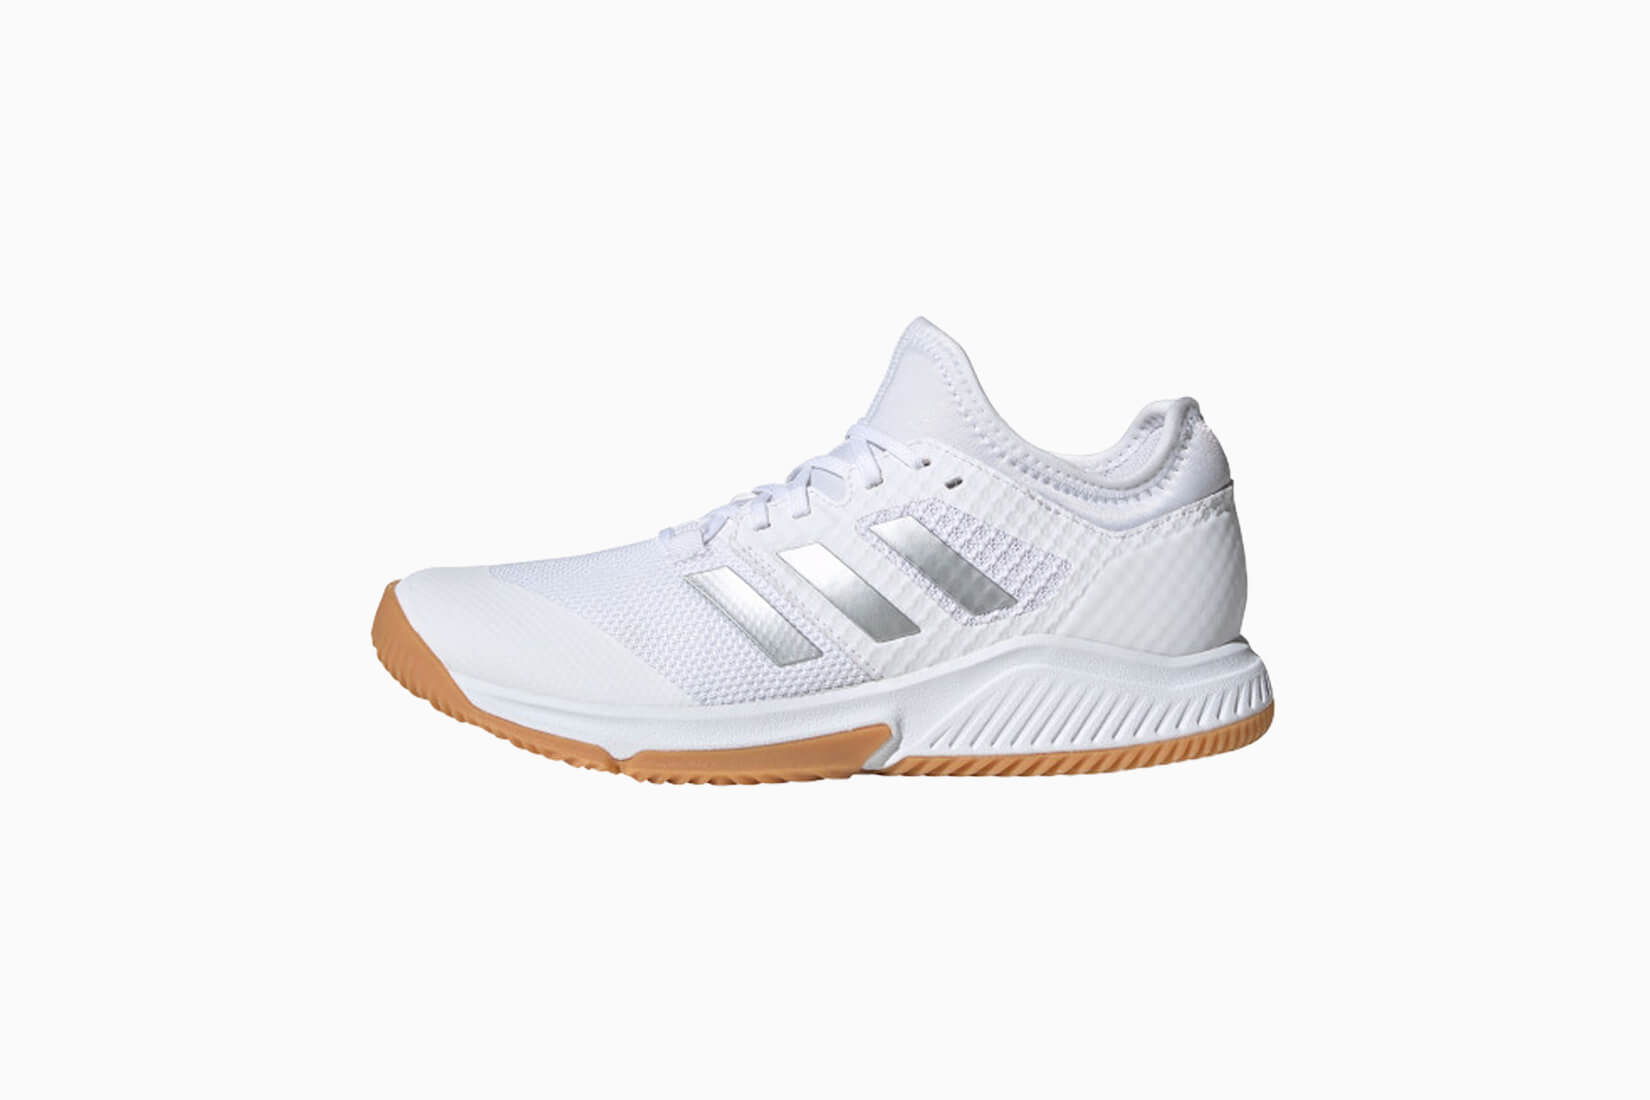 best workout shoes women adidas court team review - Luxe Digital